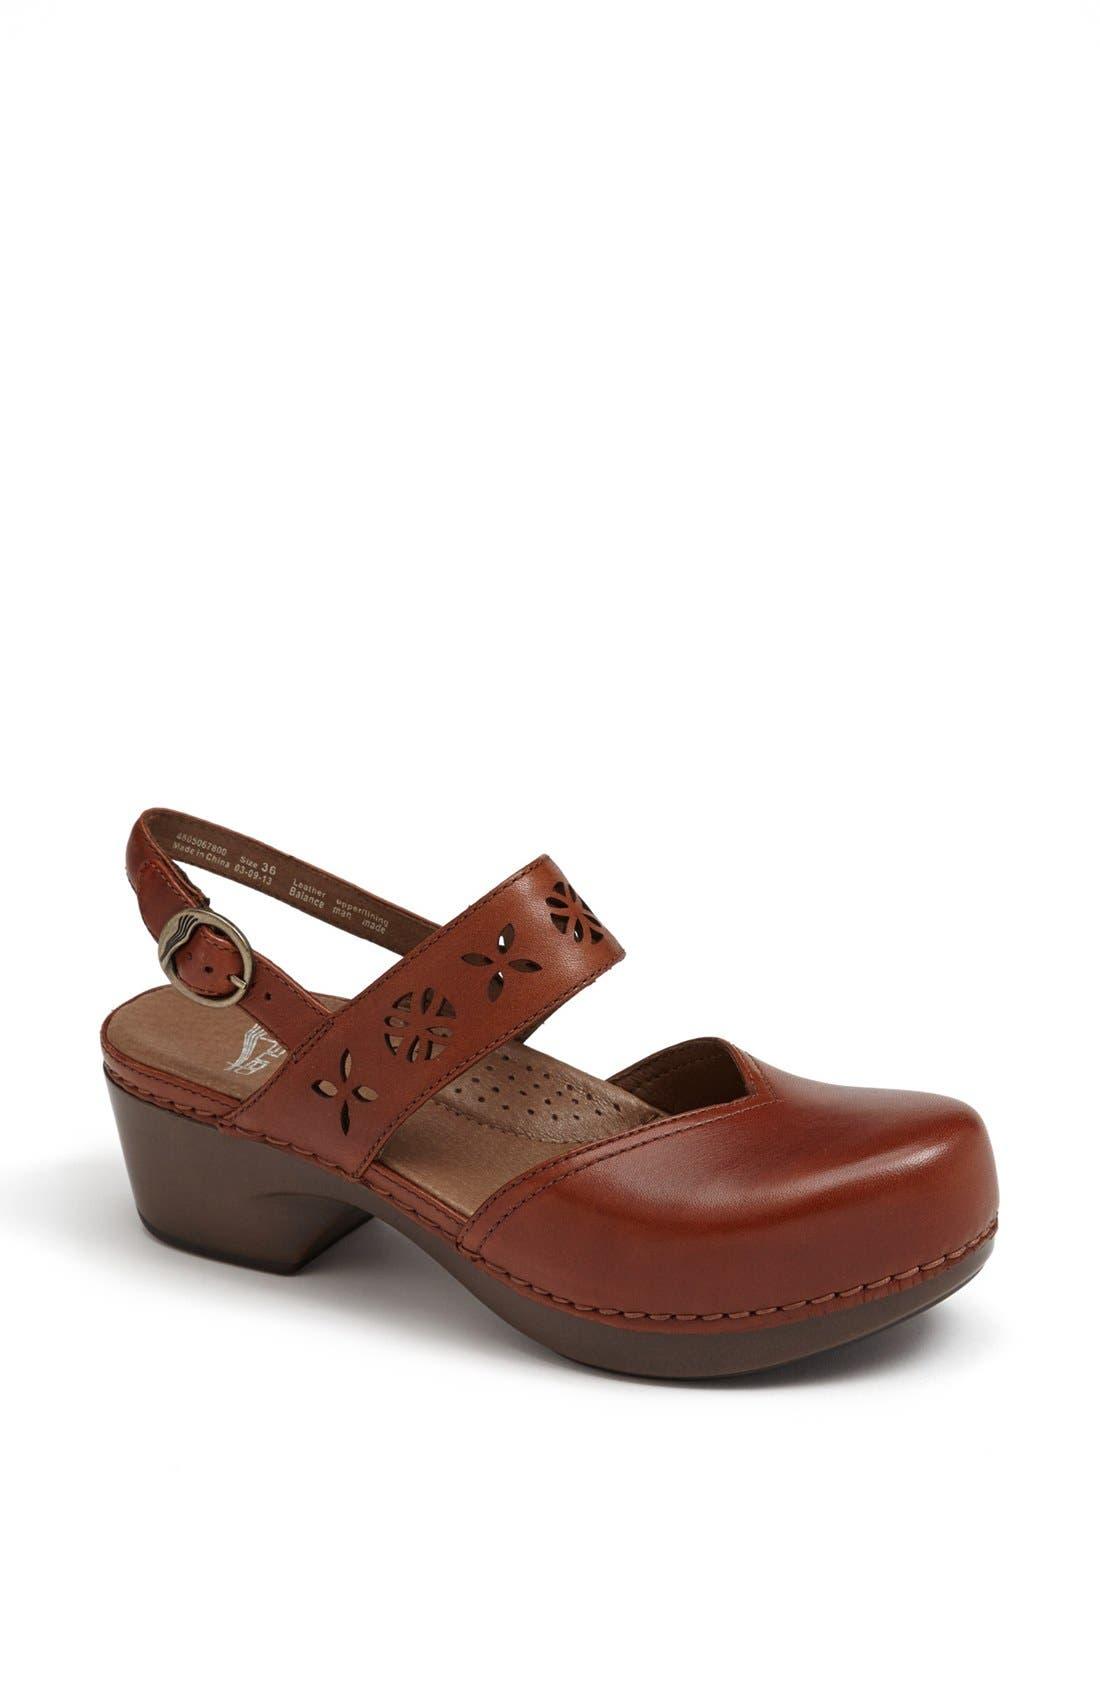 Main Image - Dansko 'Trista' Leather Clog